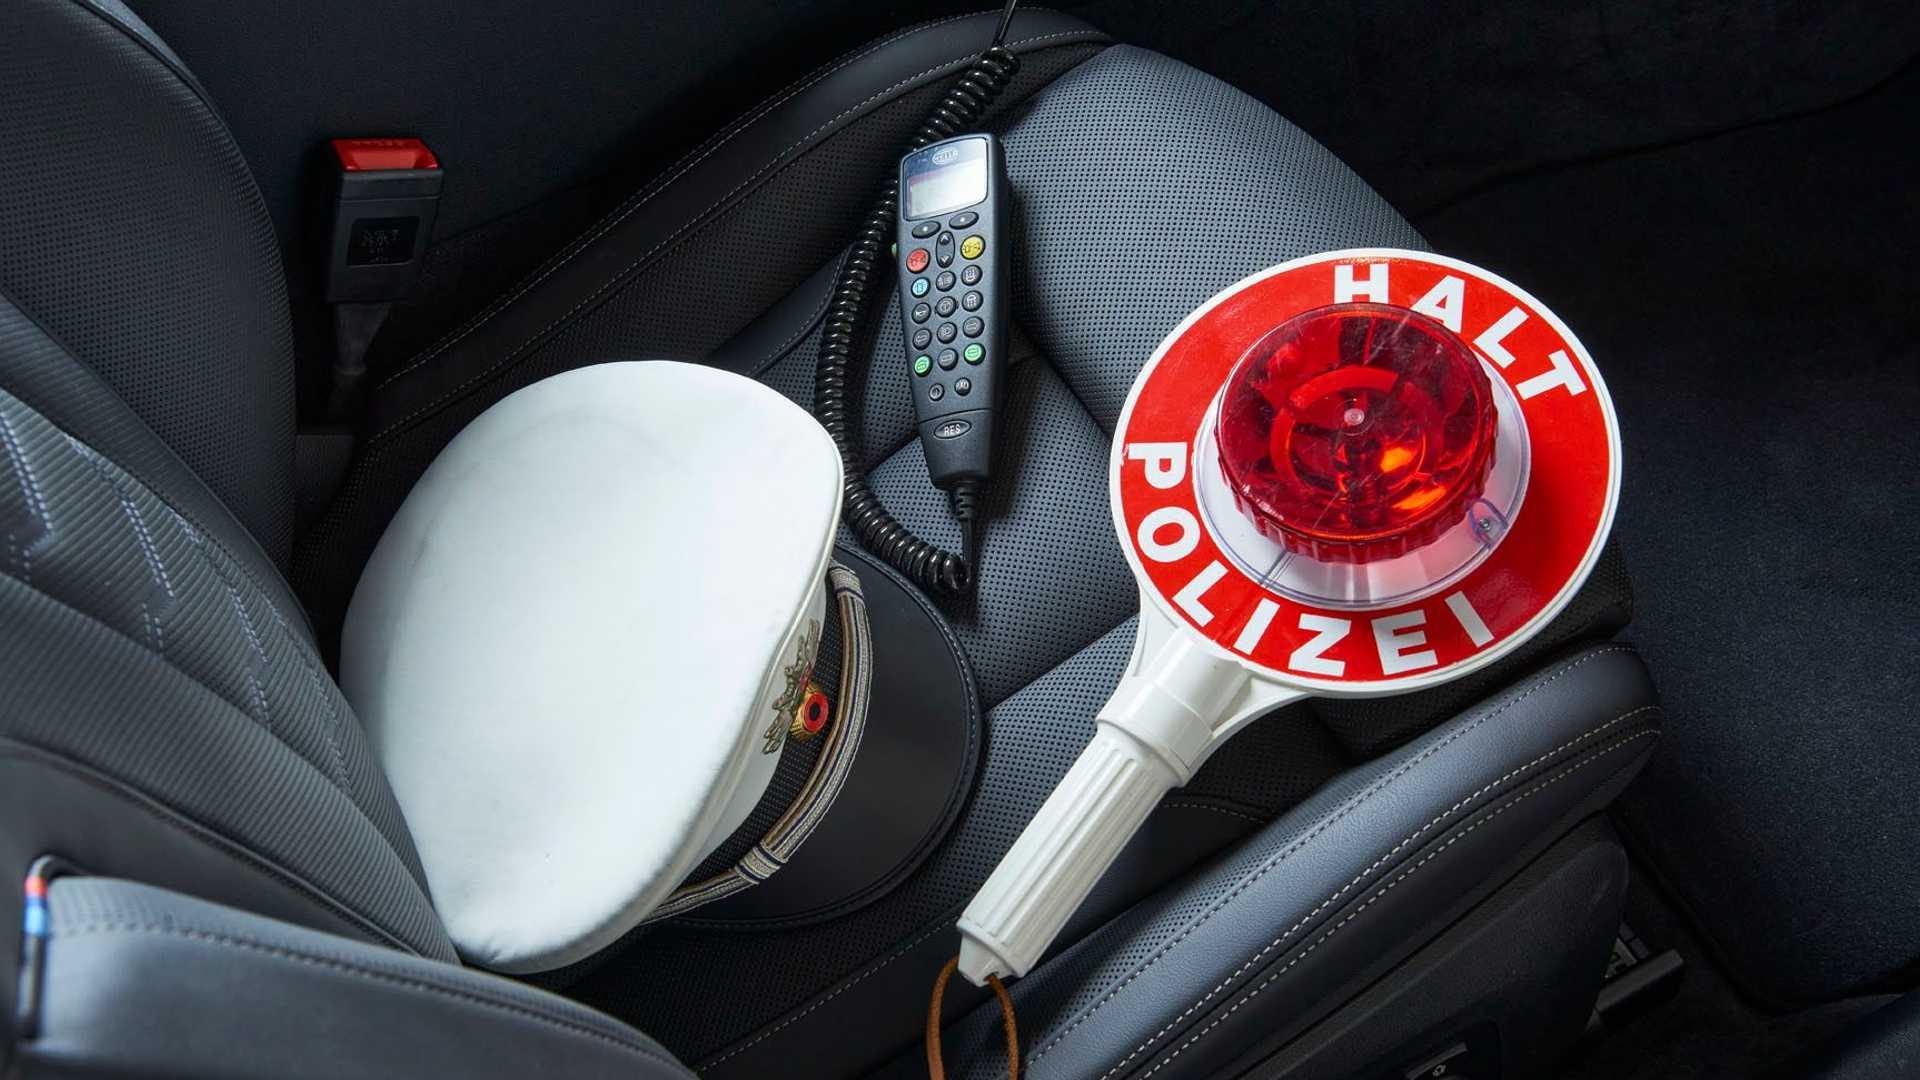 BMW-M850i-police-car-tune-it-safe-43